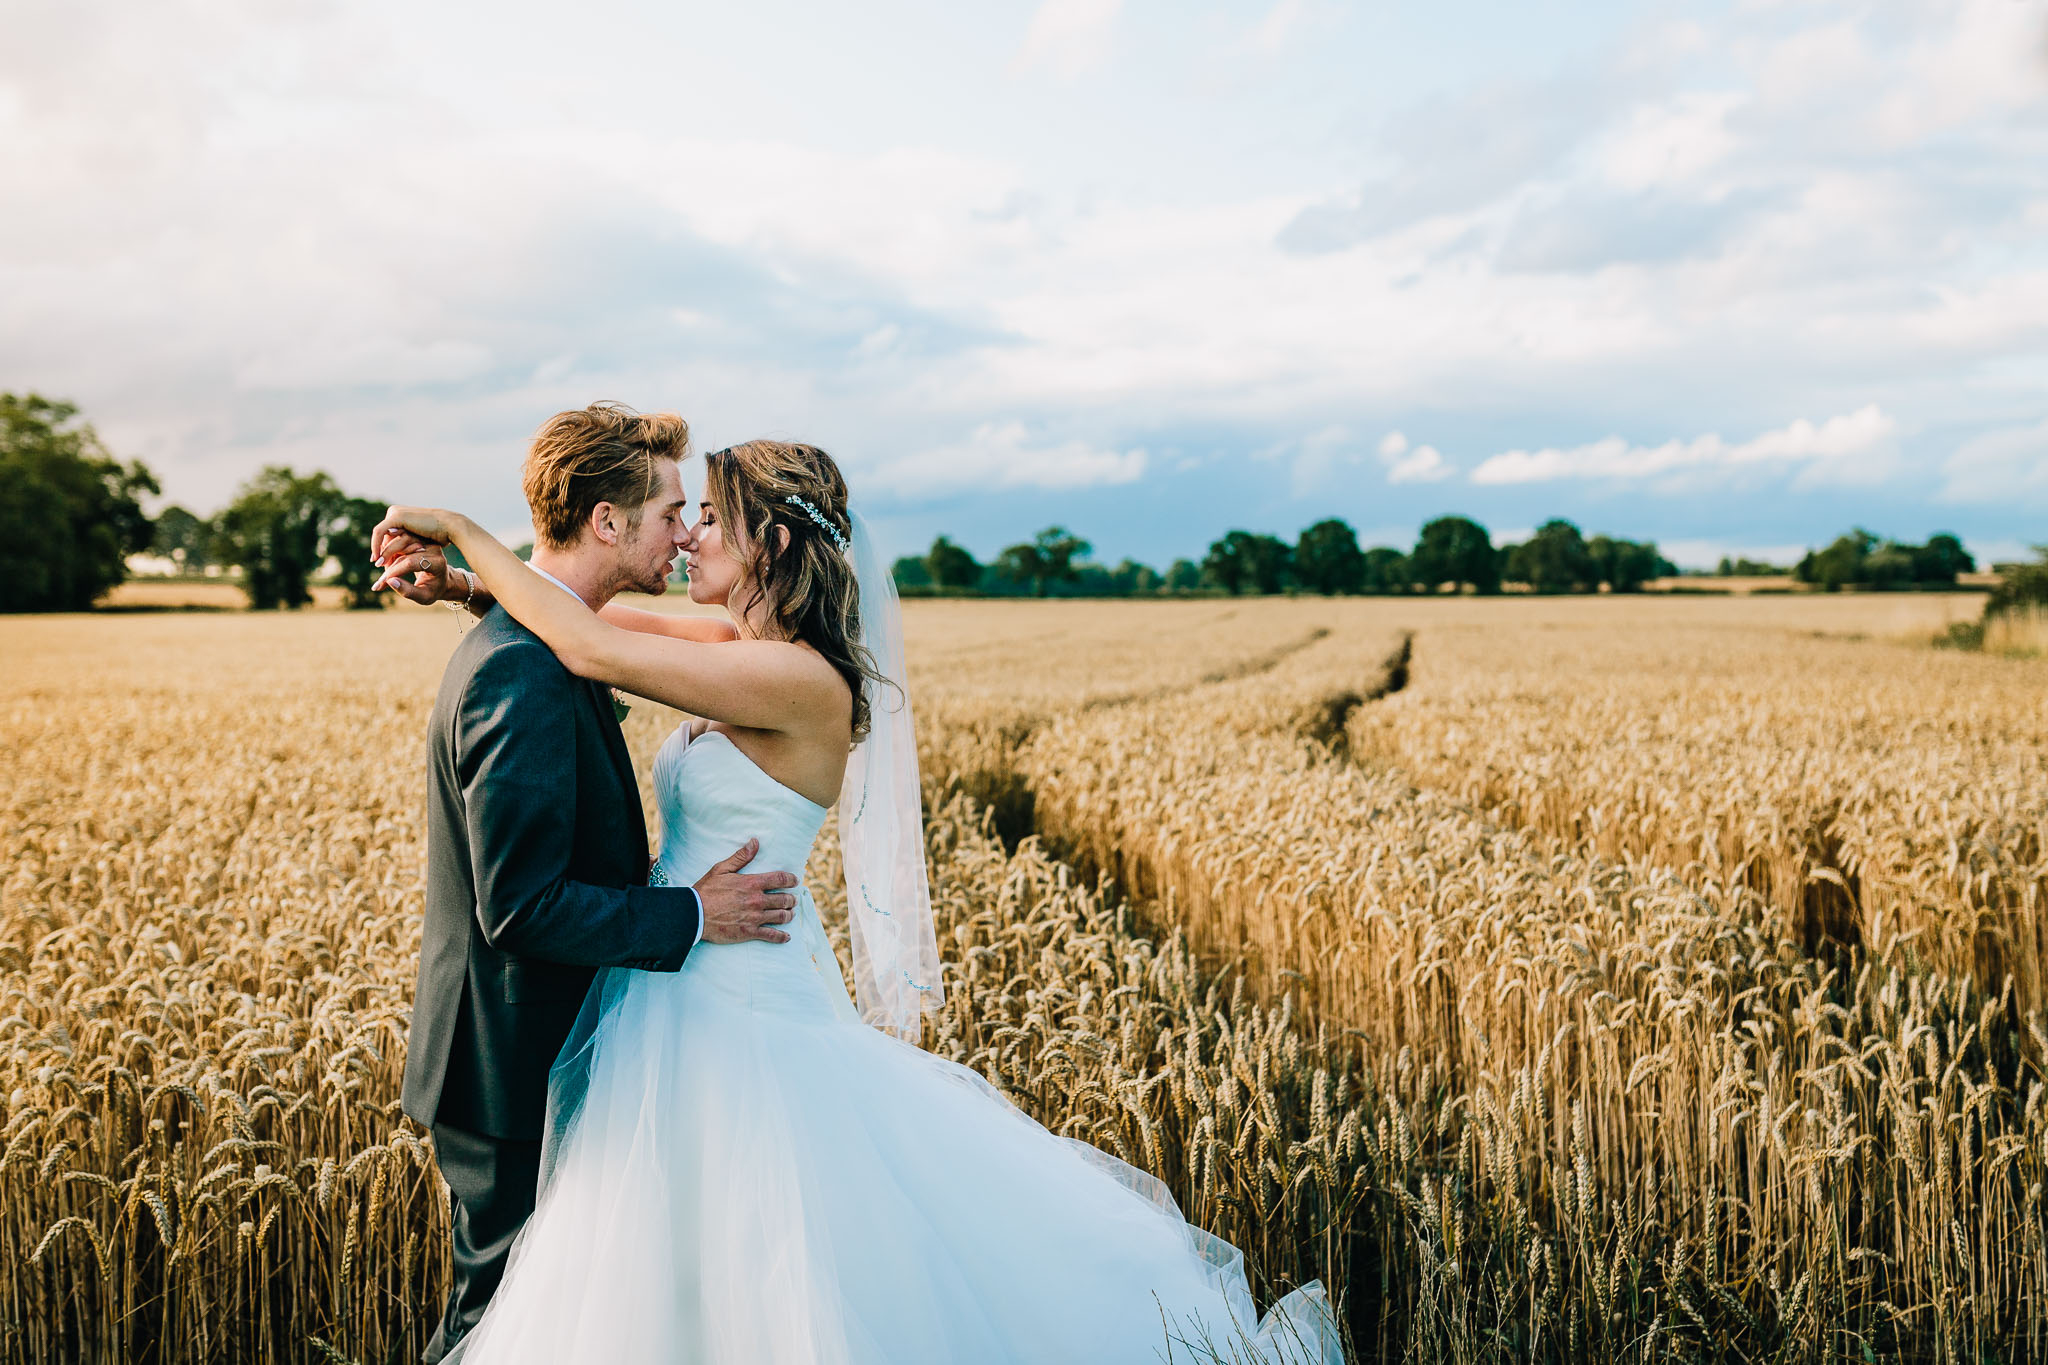 BRIDAL PORTRAIT AT MYTHE BARN WEDDING VENUE LEICESTER